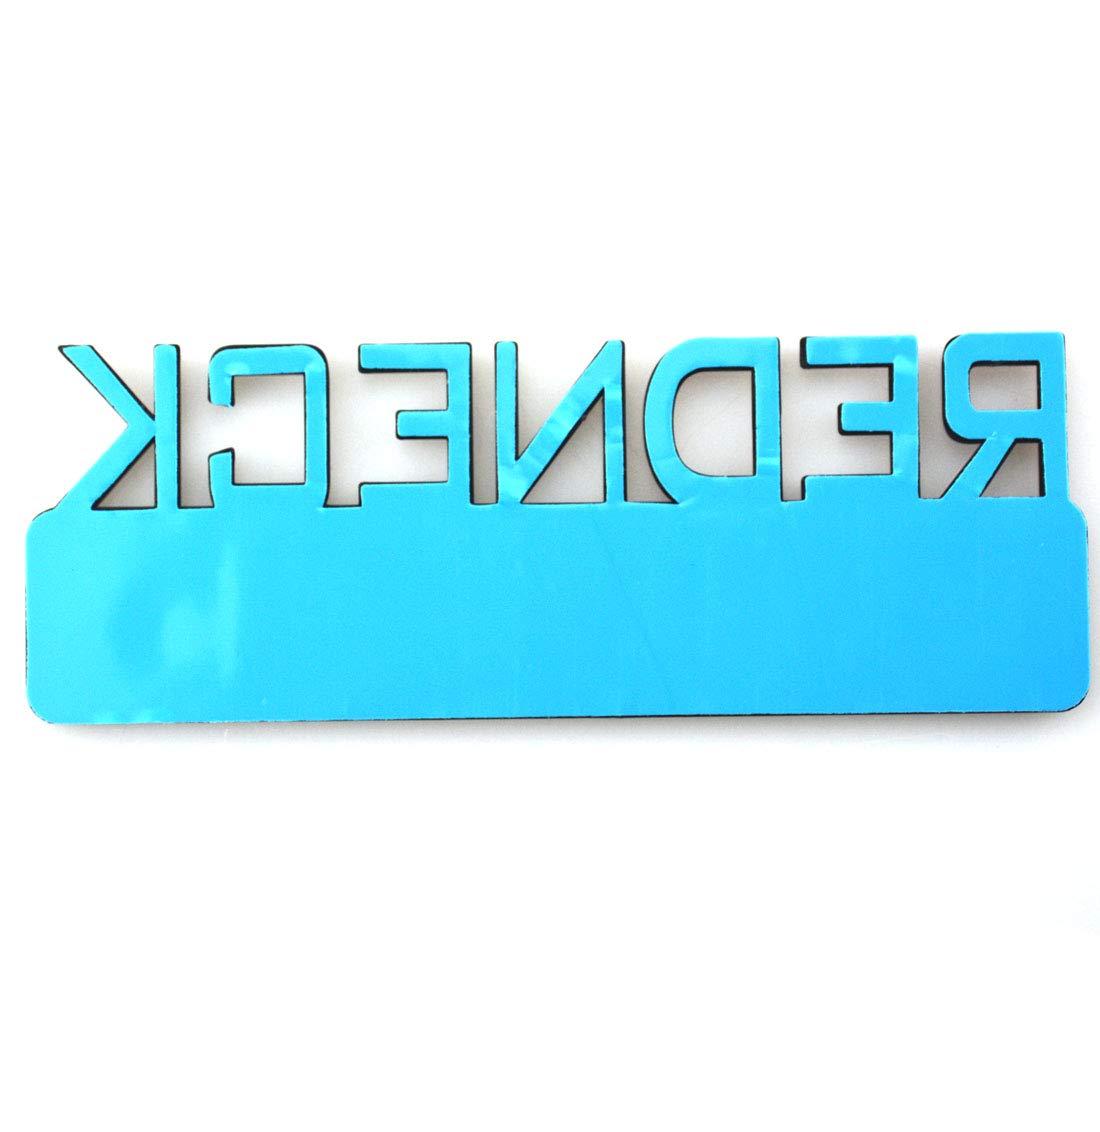 Matte Black 2pcs REDNECK EDITION CAR EMBLEM Chrome Badge 3D Sticker Decal Compatible with F-150 F250 F350 Silverado RAM 1500